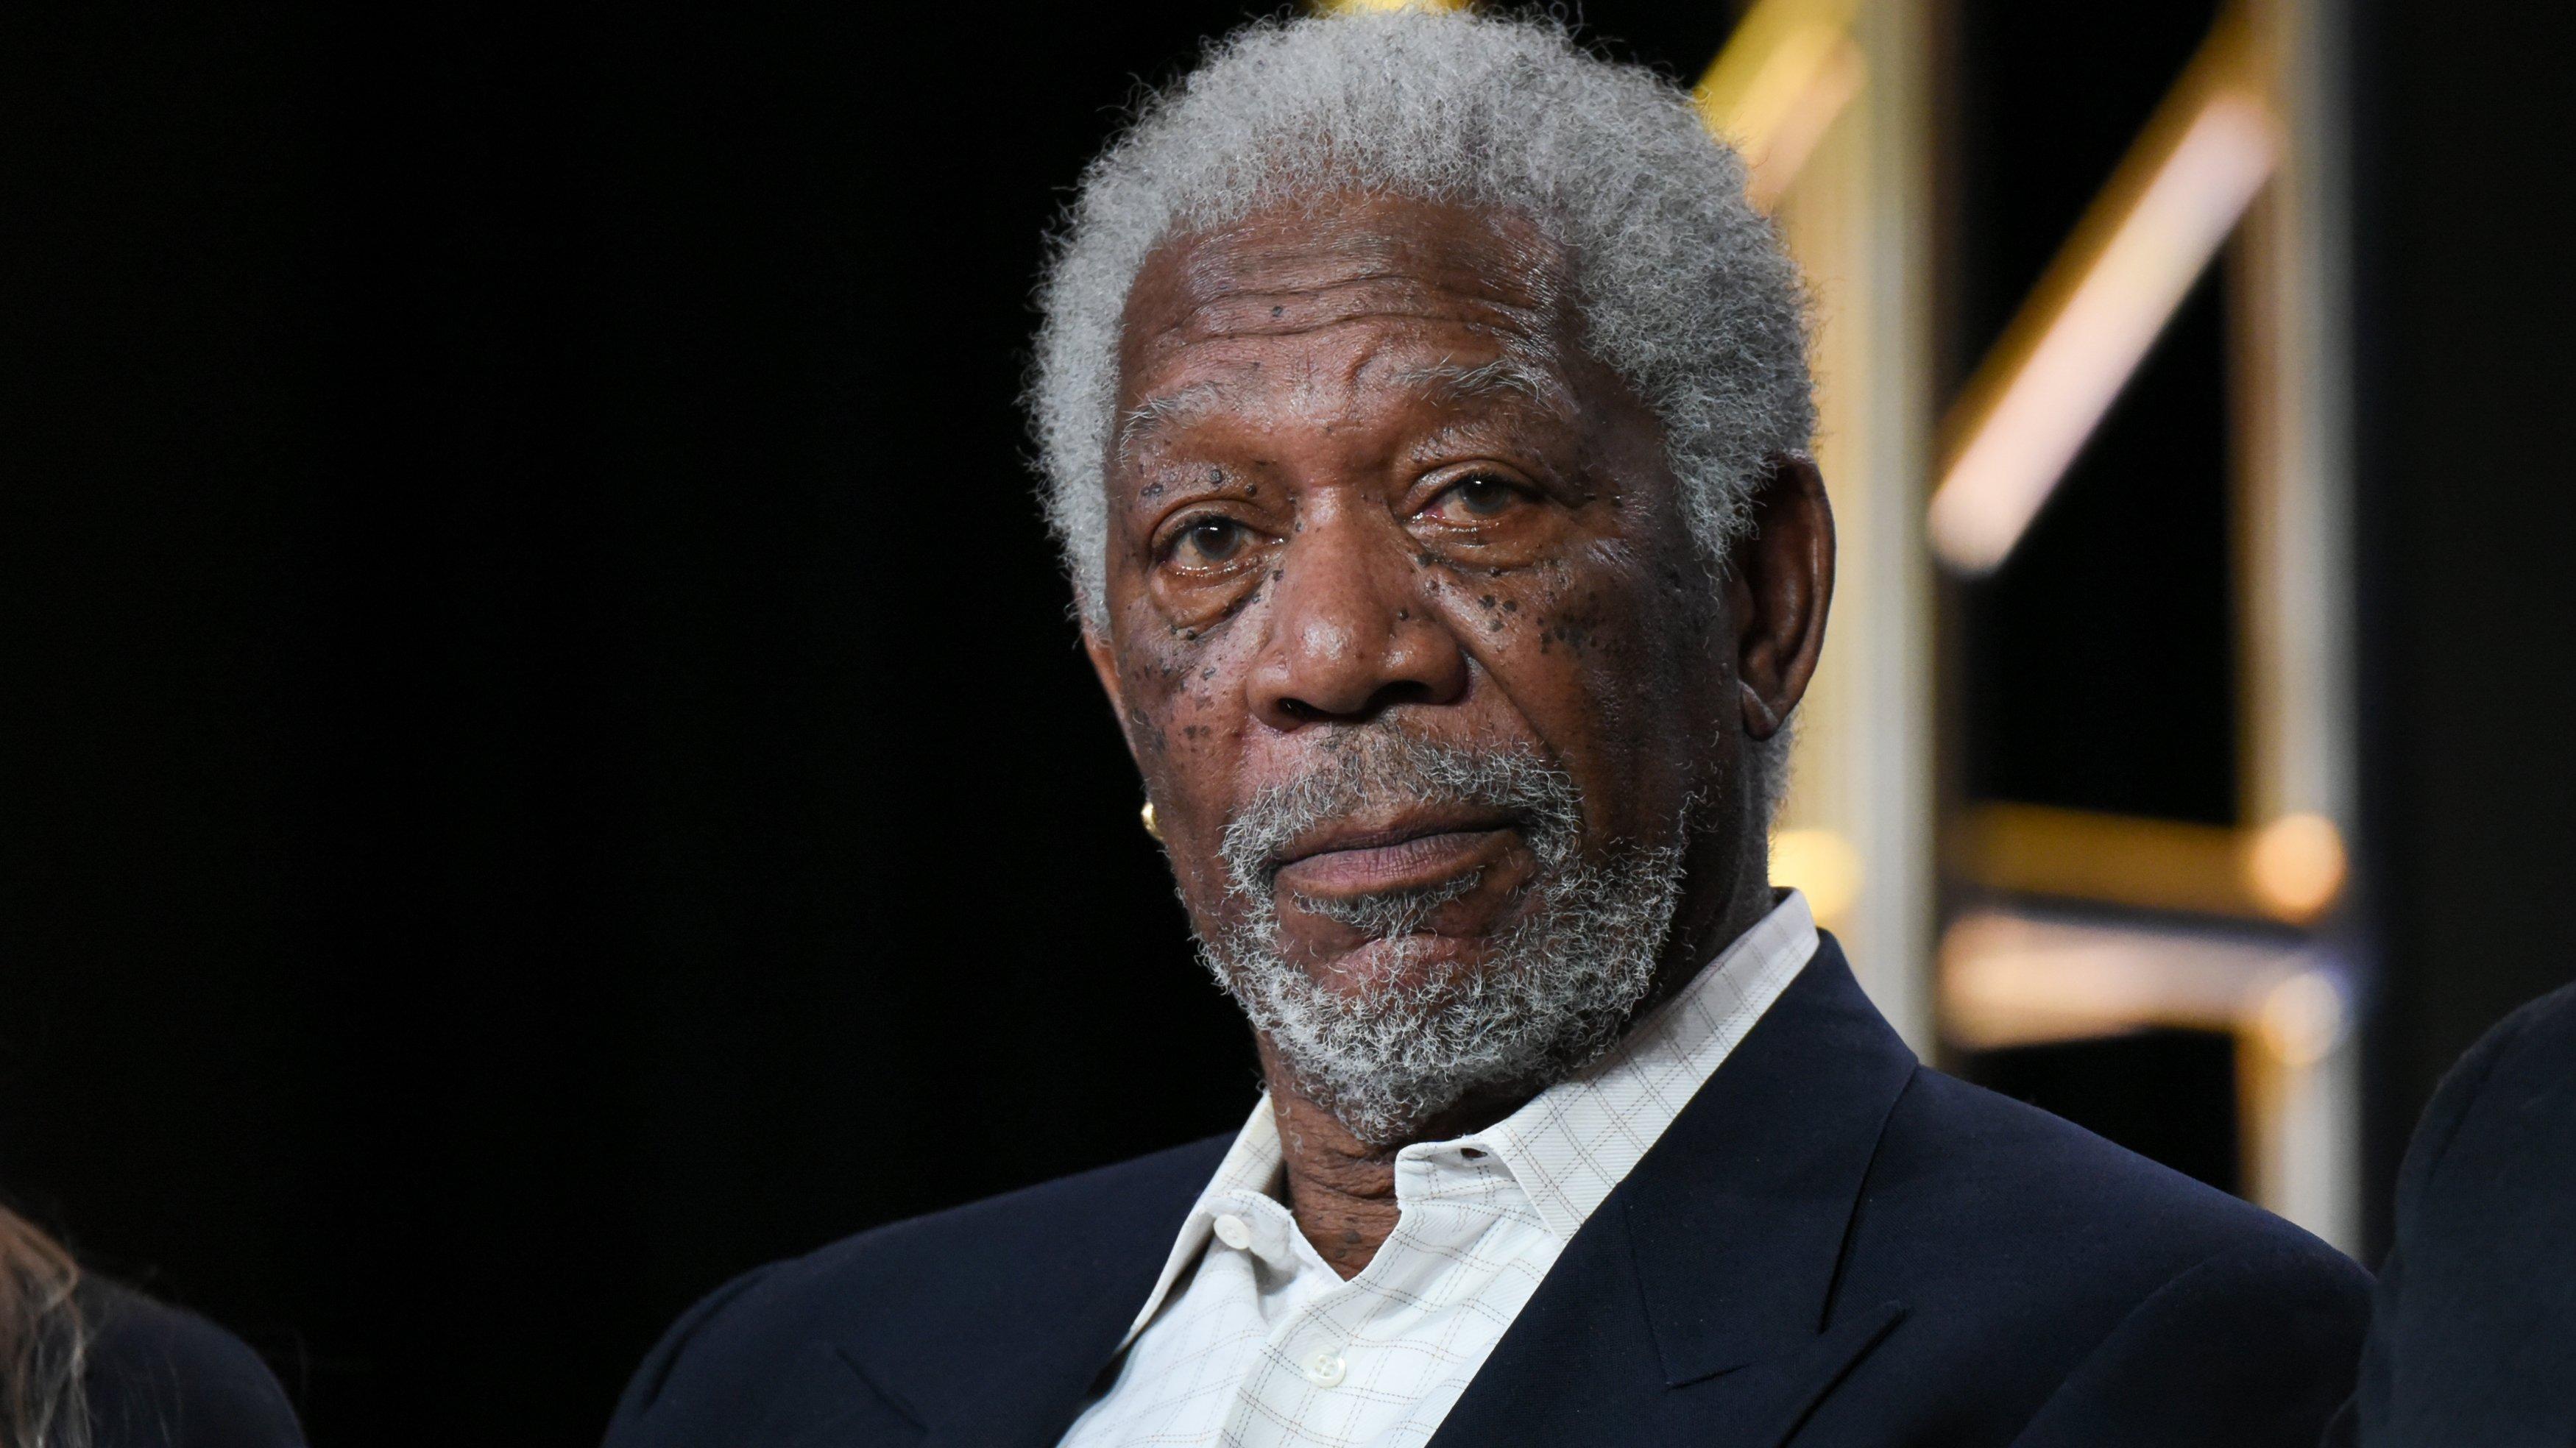 Morgan Freeman Accused of Sexual Harassment